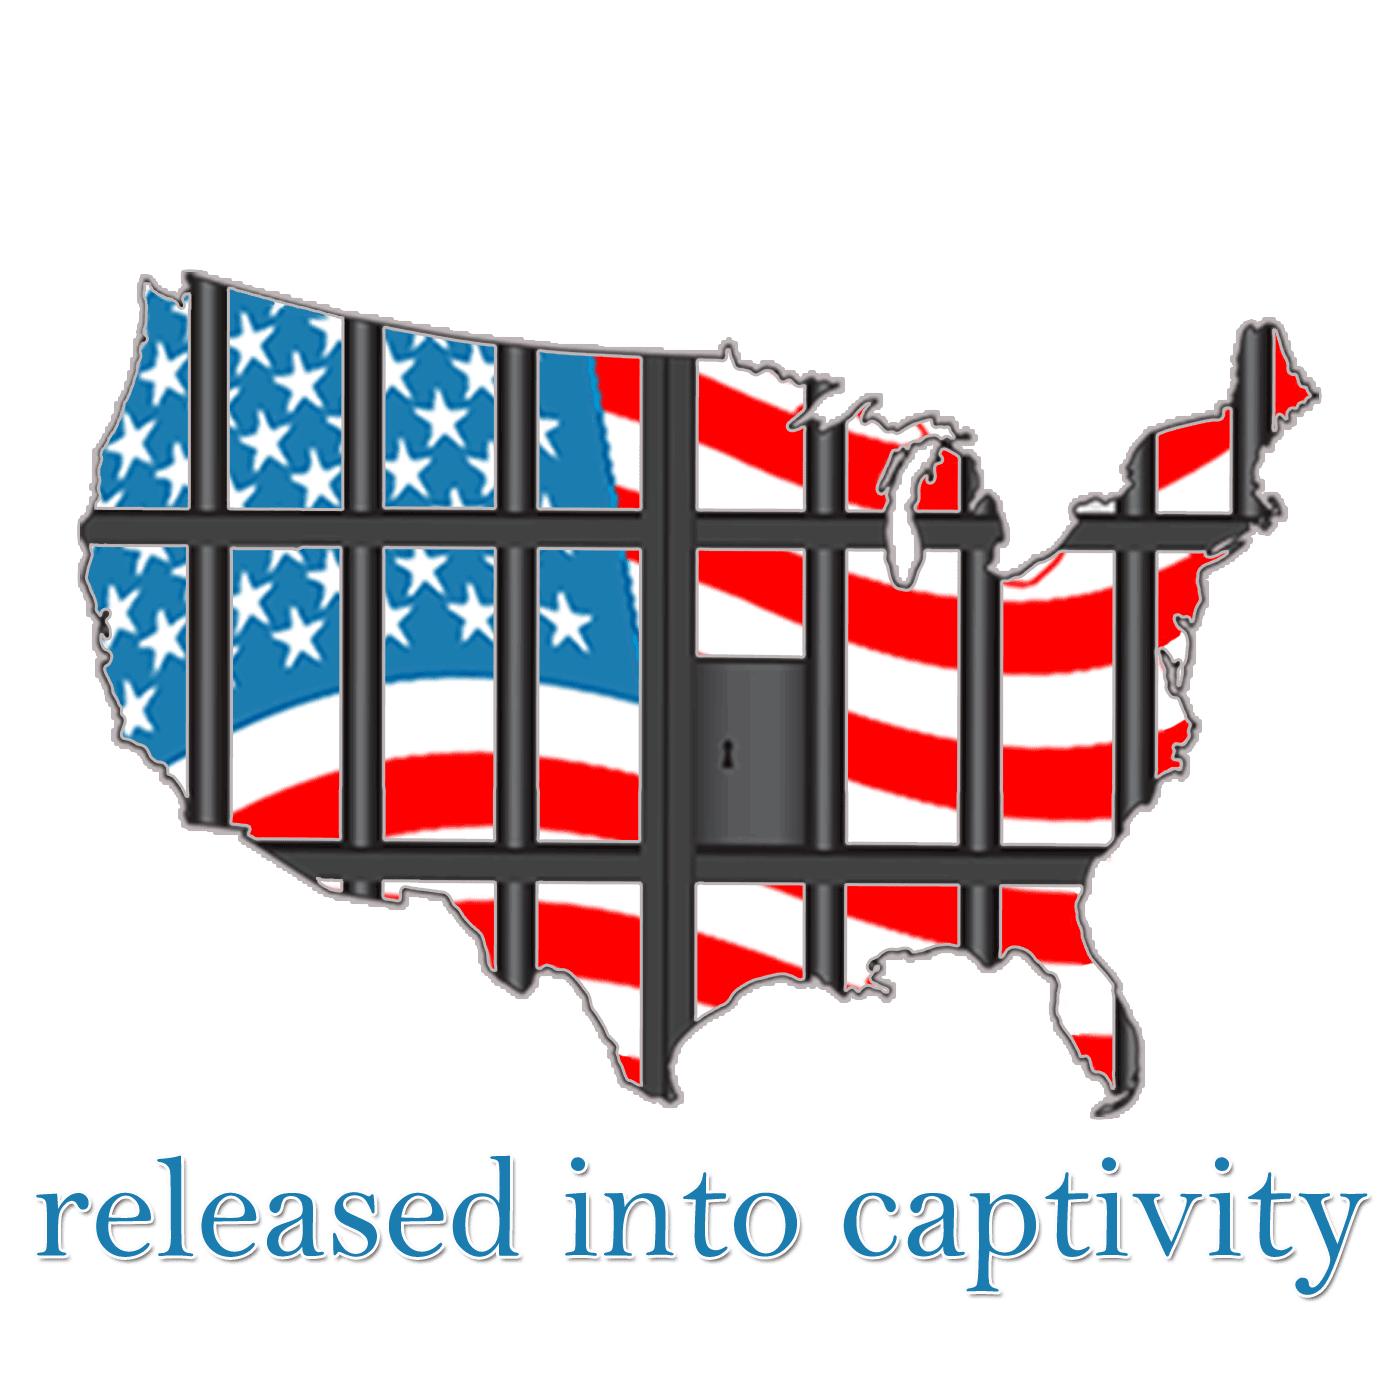 clip art black and white Prison clipart psychopath. Captive free on dumielauxepices.